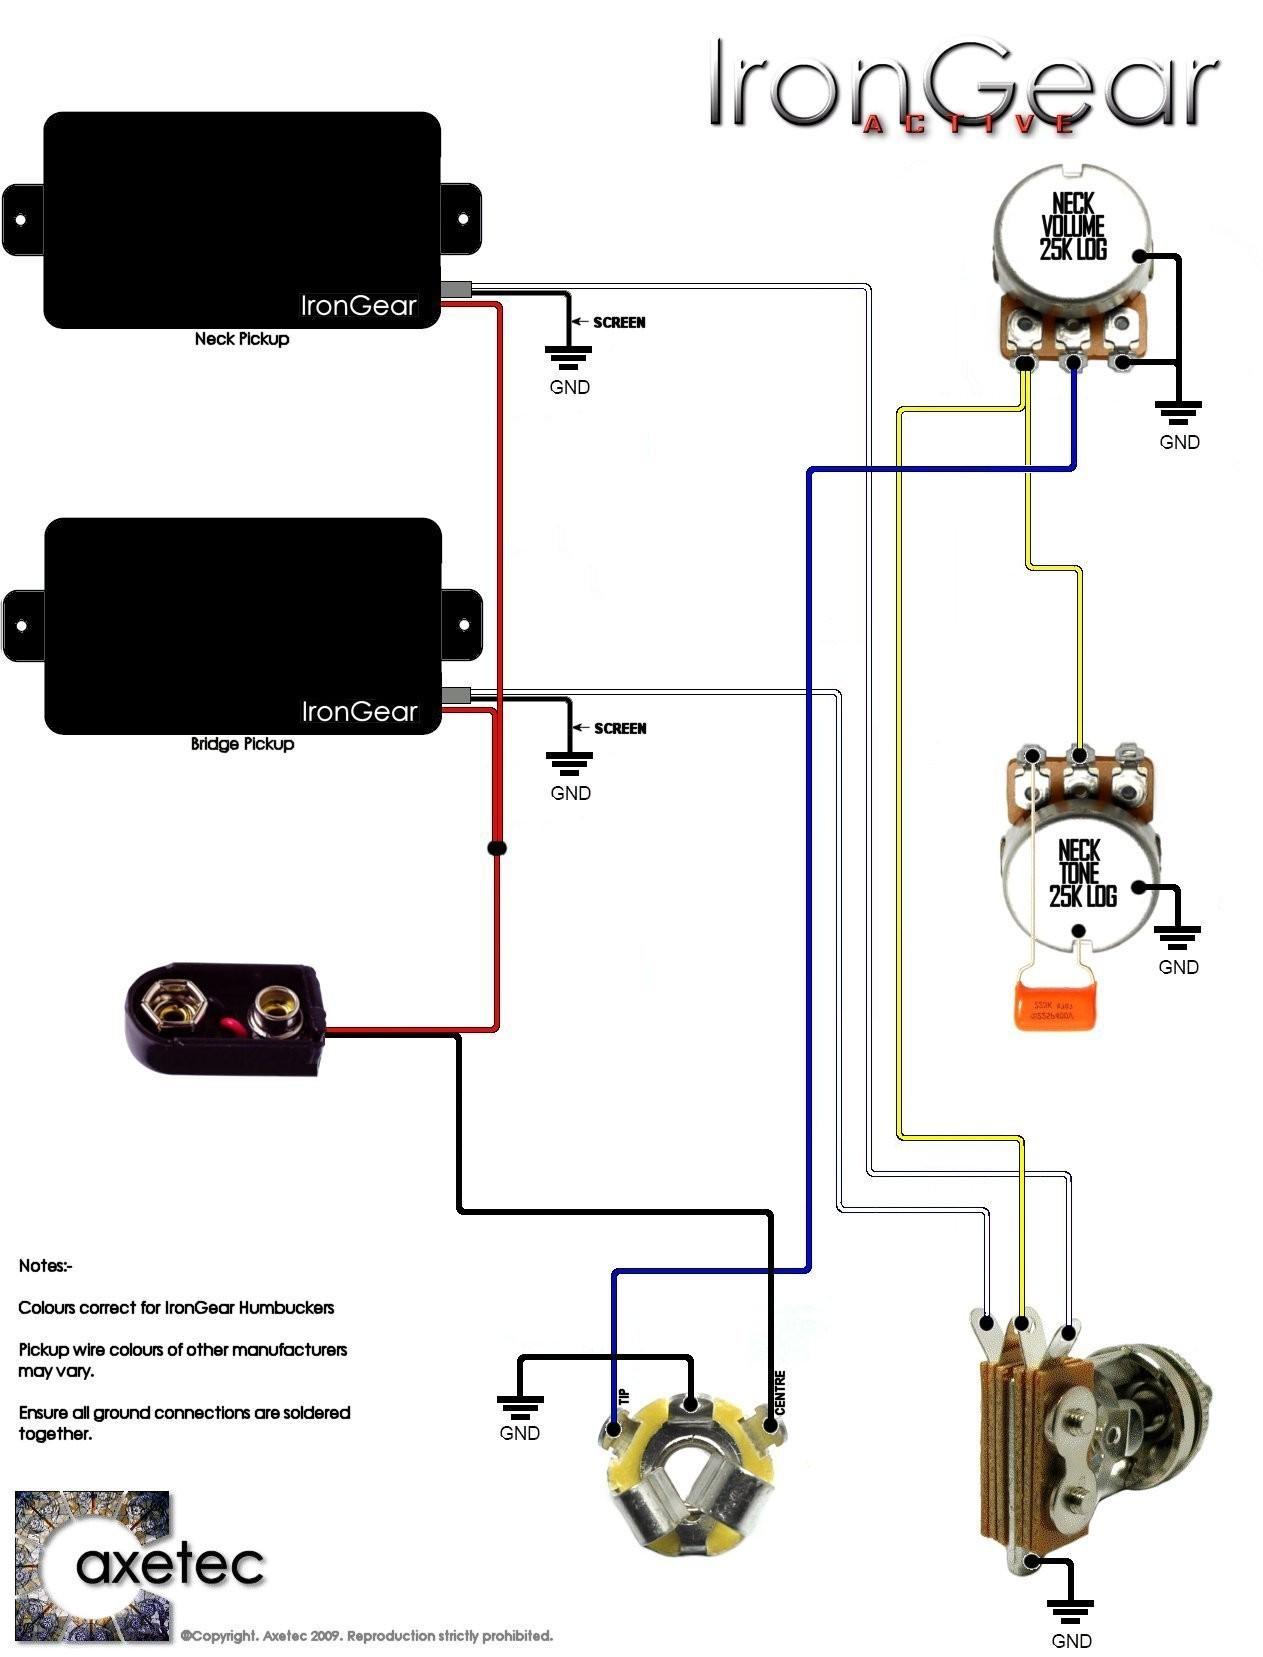 Ibanez Electric Guitar Wiring Diagram Inspirationa Guitar Wiring Diagram 2 Humbucker 1 Volume 1 Tone – Volovetsfo